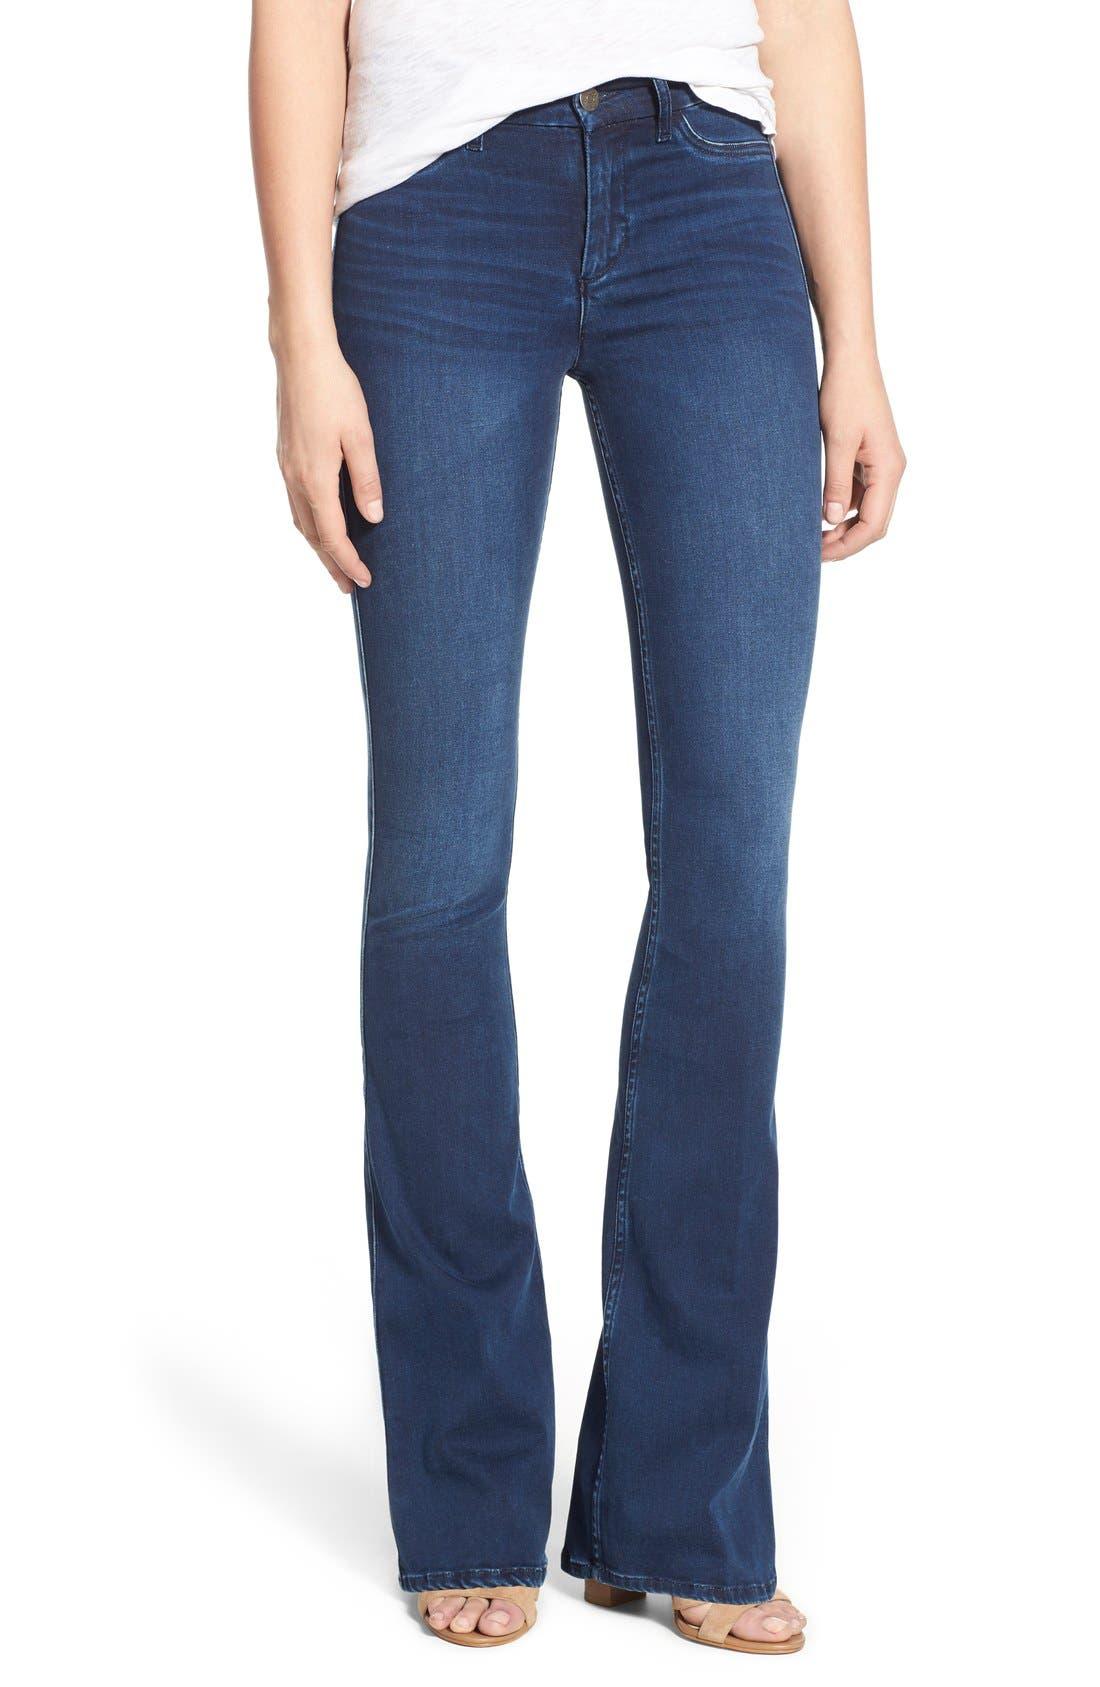 Main Image - M.i.h. Jeans 'Superfit Marrakesh' Flare Jeans (Circle Blue)